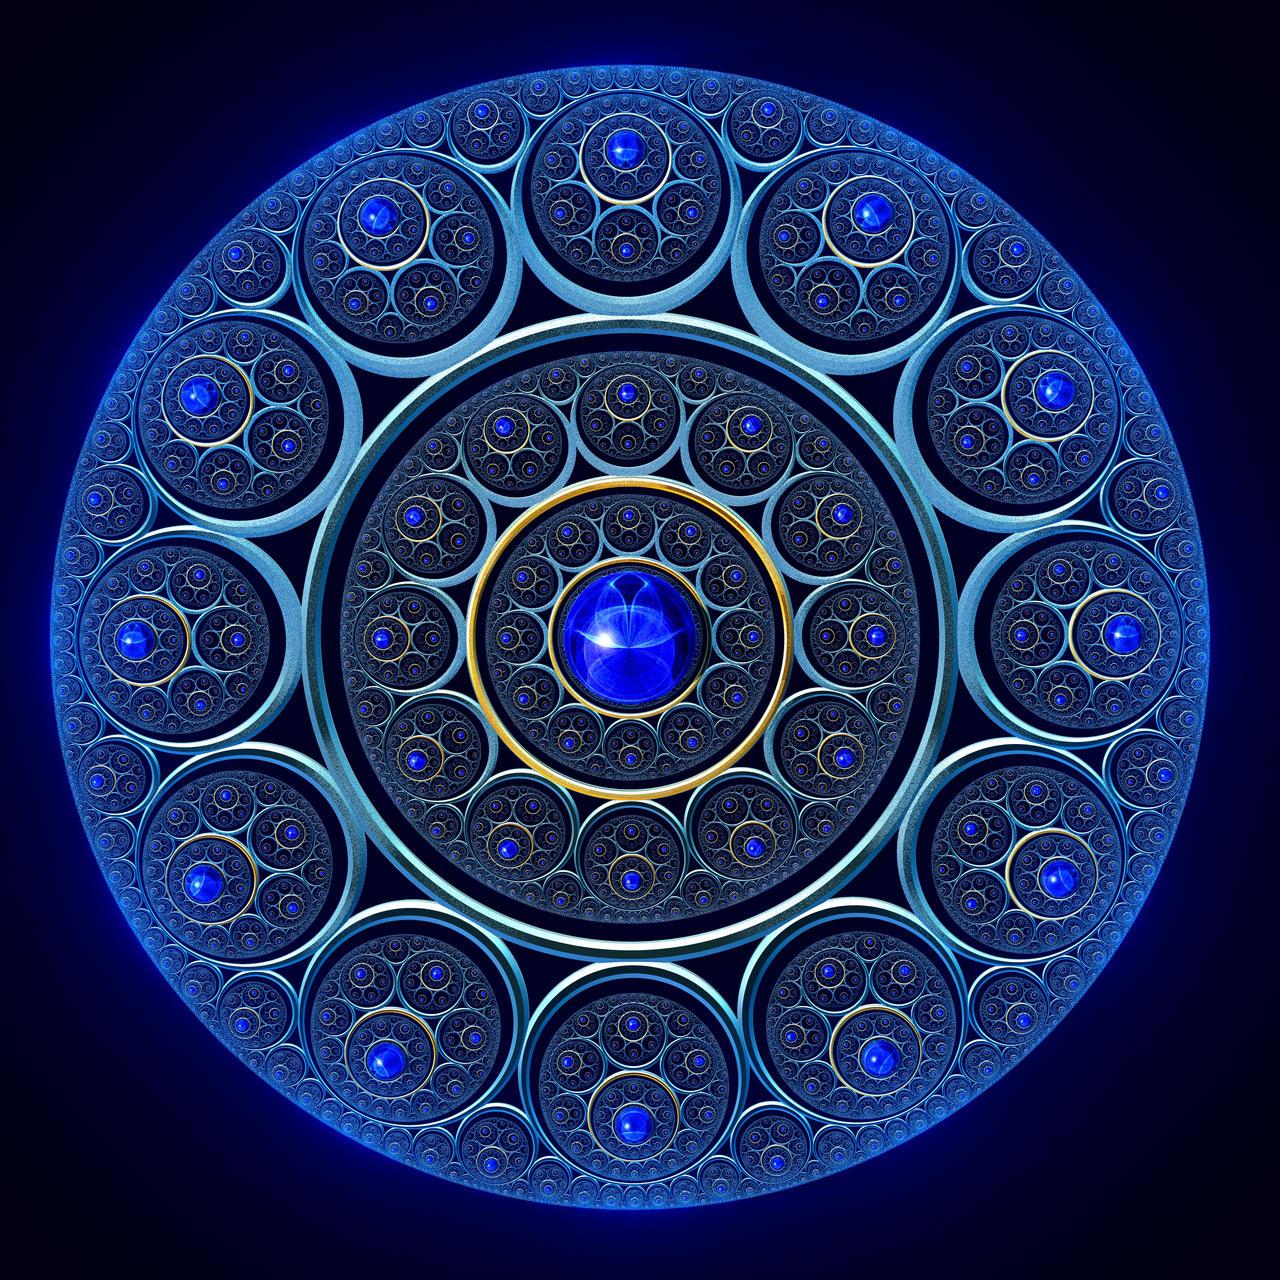 http://fc07.deviantart.net/fs50/i/2009/314/9/b/Circle_of_Life_by_Capstoned.jpg